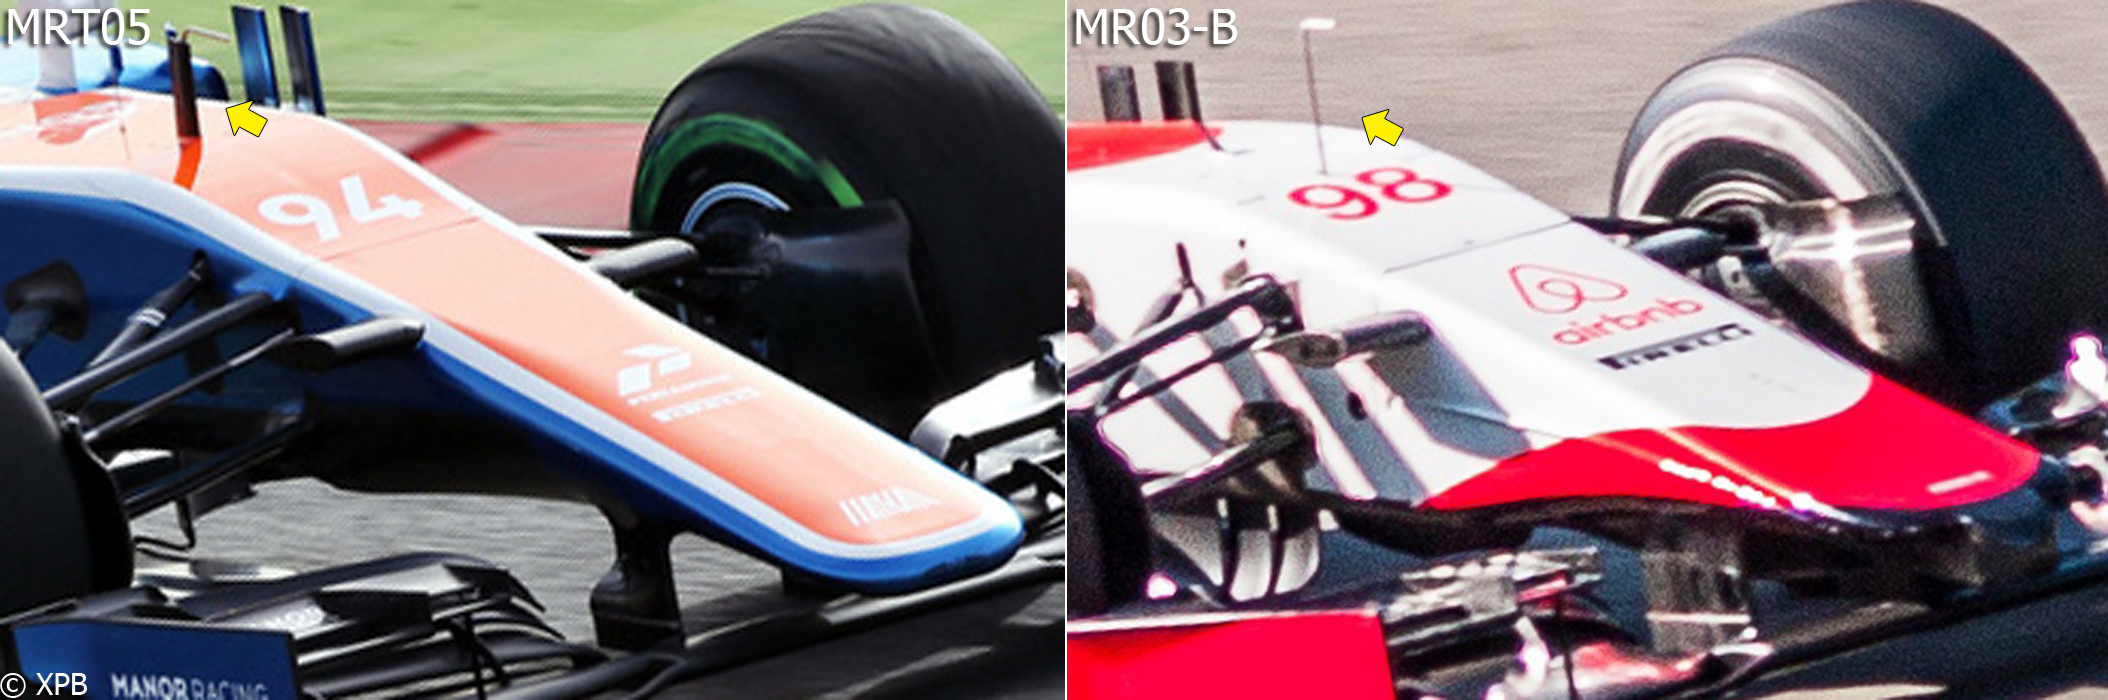 mrt05-nose-cone(2)